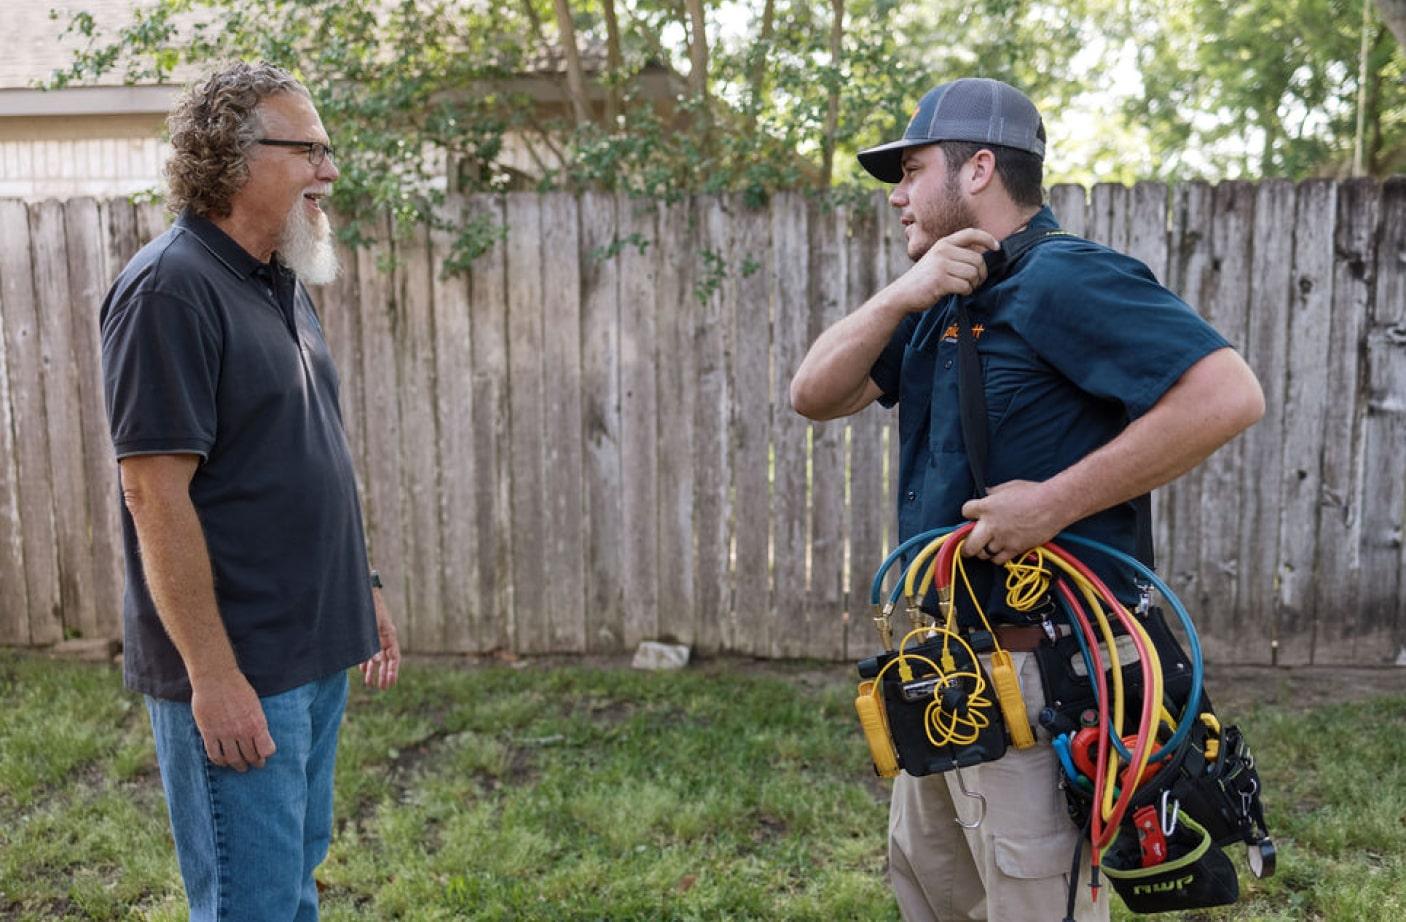 pickett employee talking to a customer